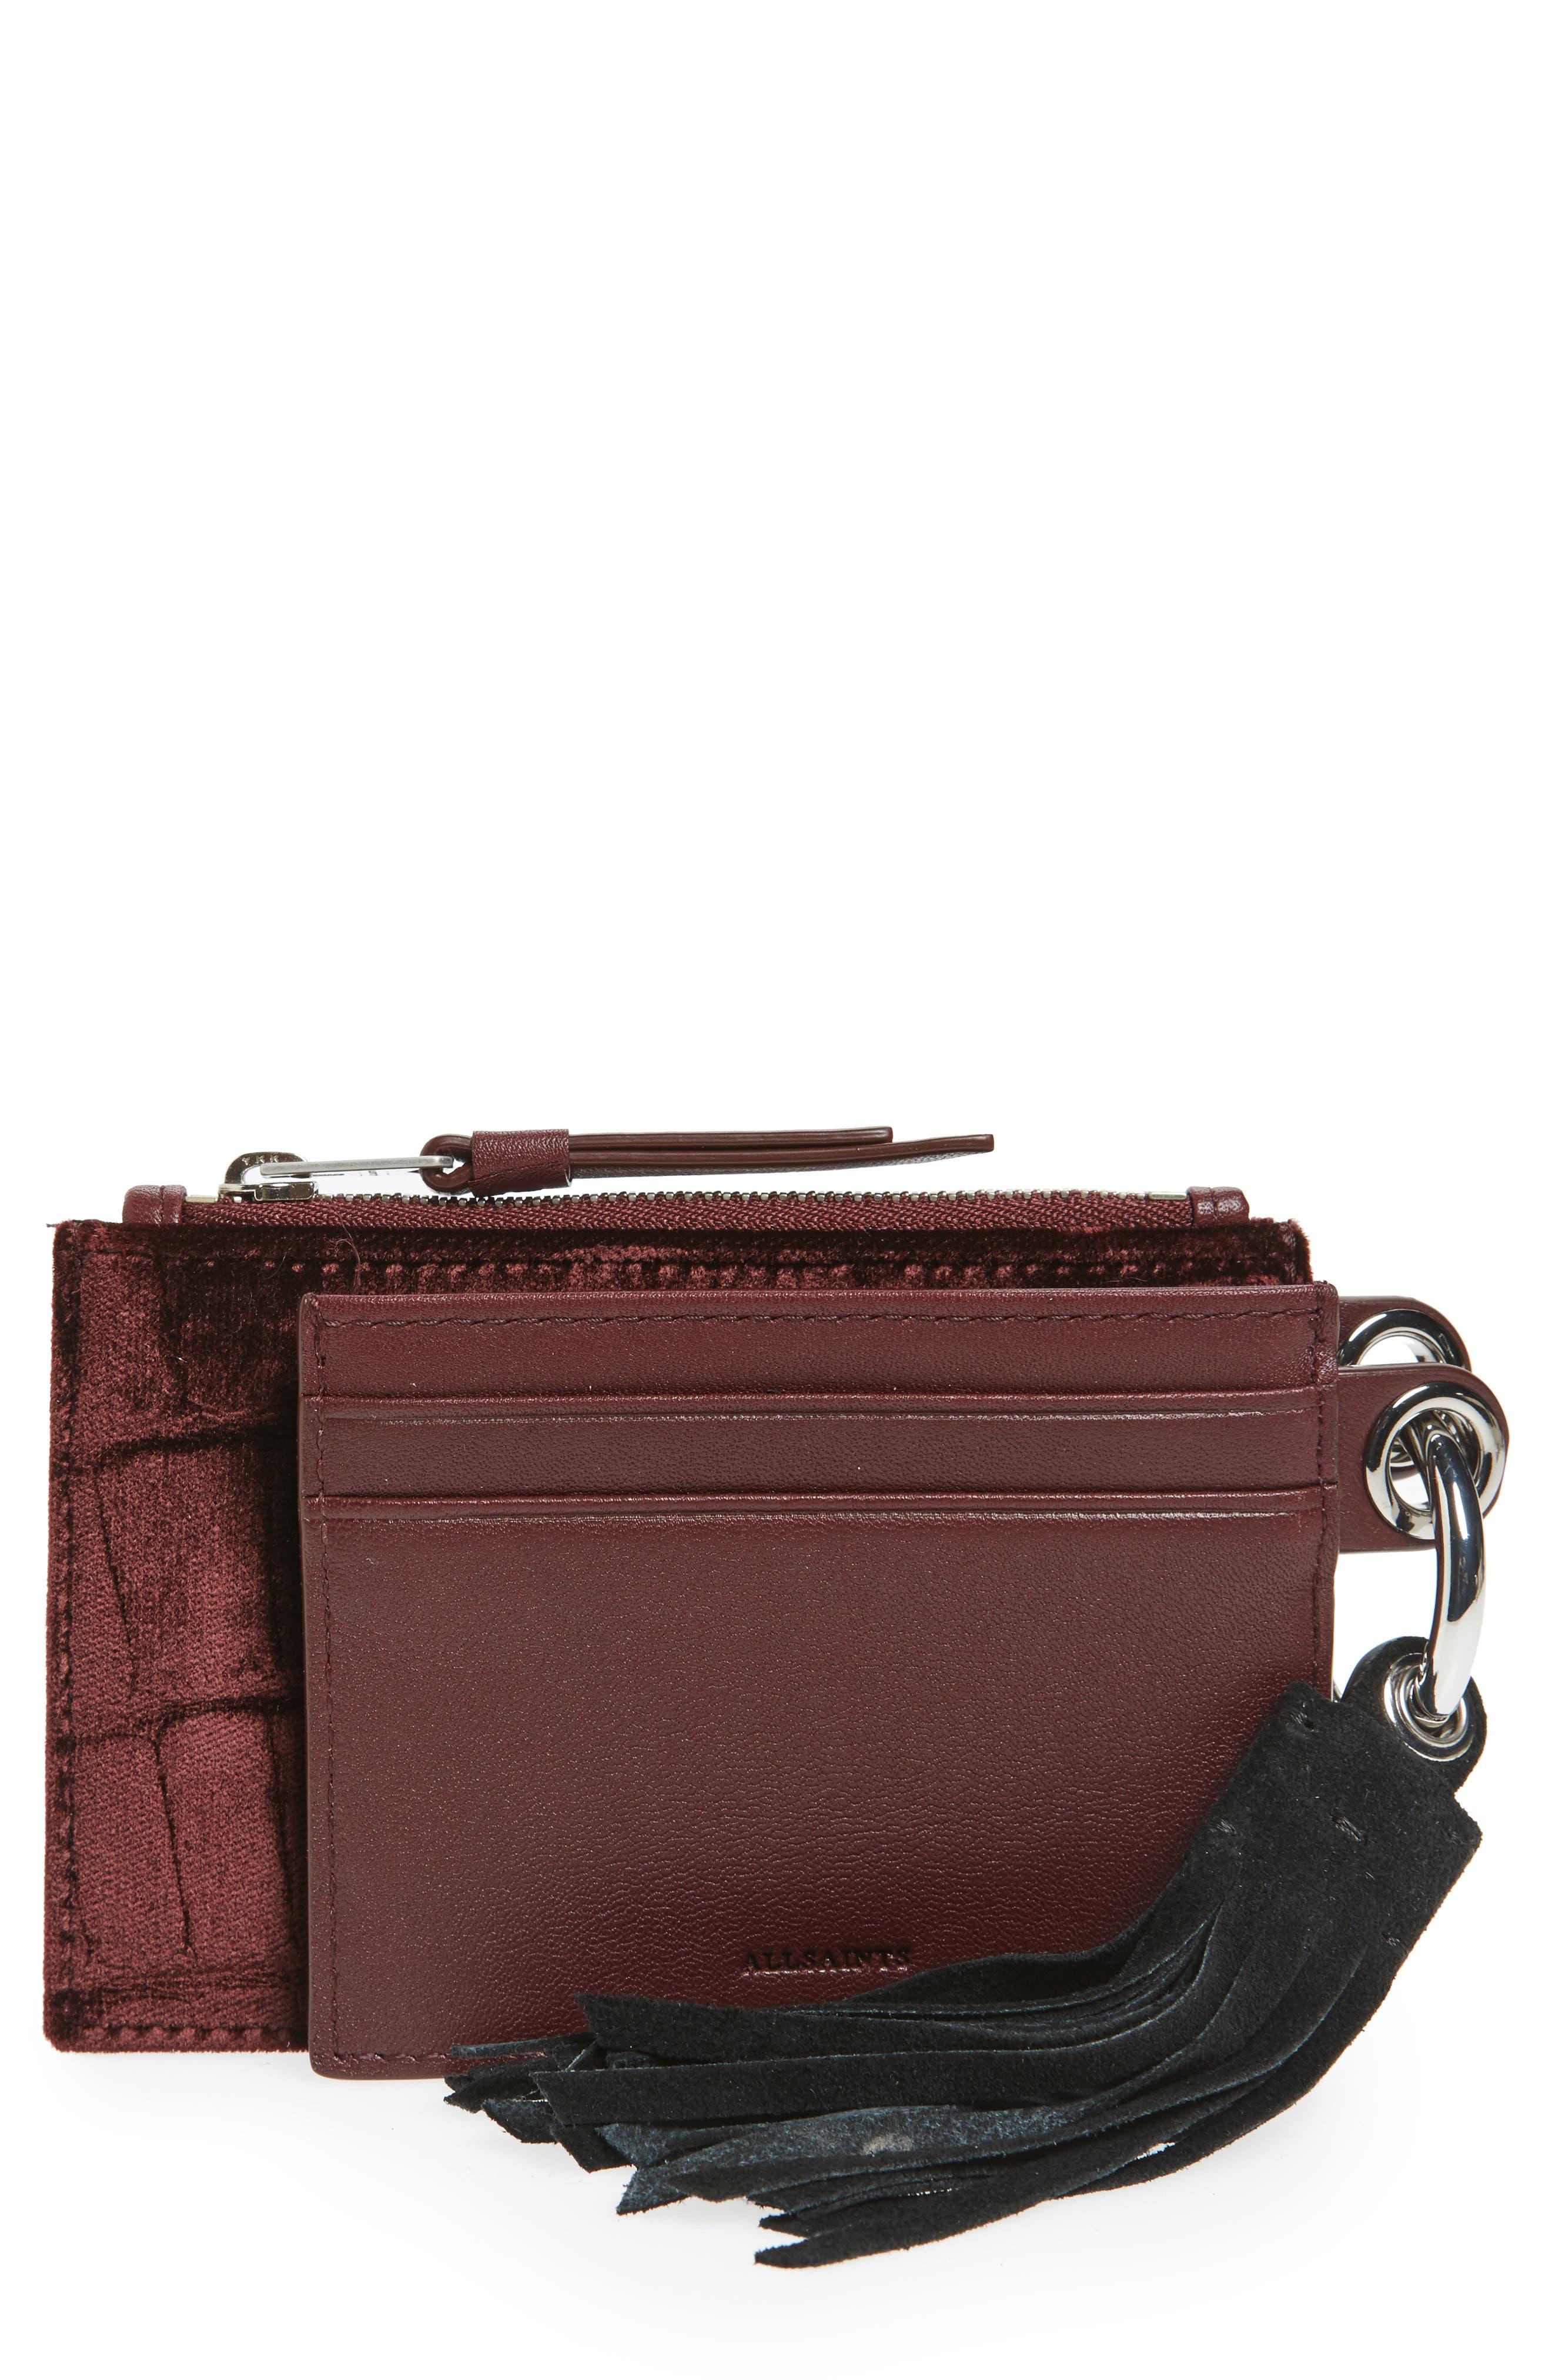 Dive Key Fob Leather & Suede Zip Pouch & Card Case,                             Main thumbnail 1, color,                             930